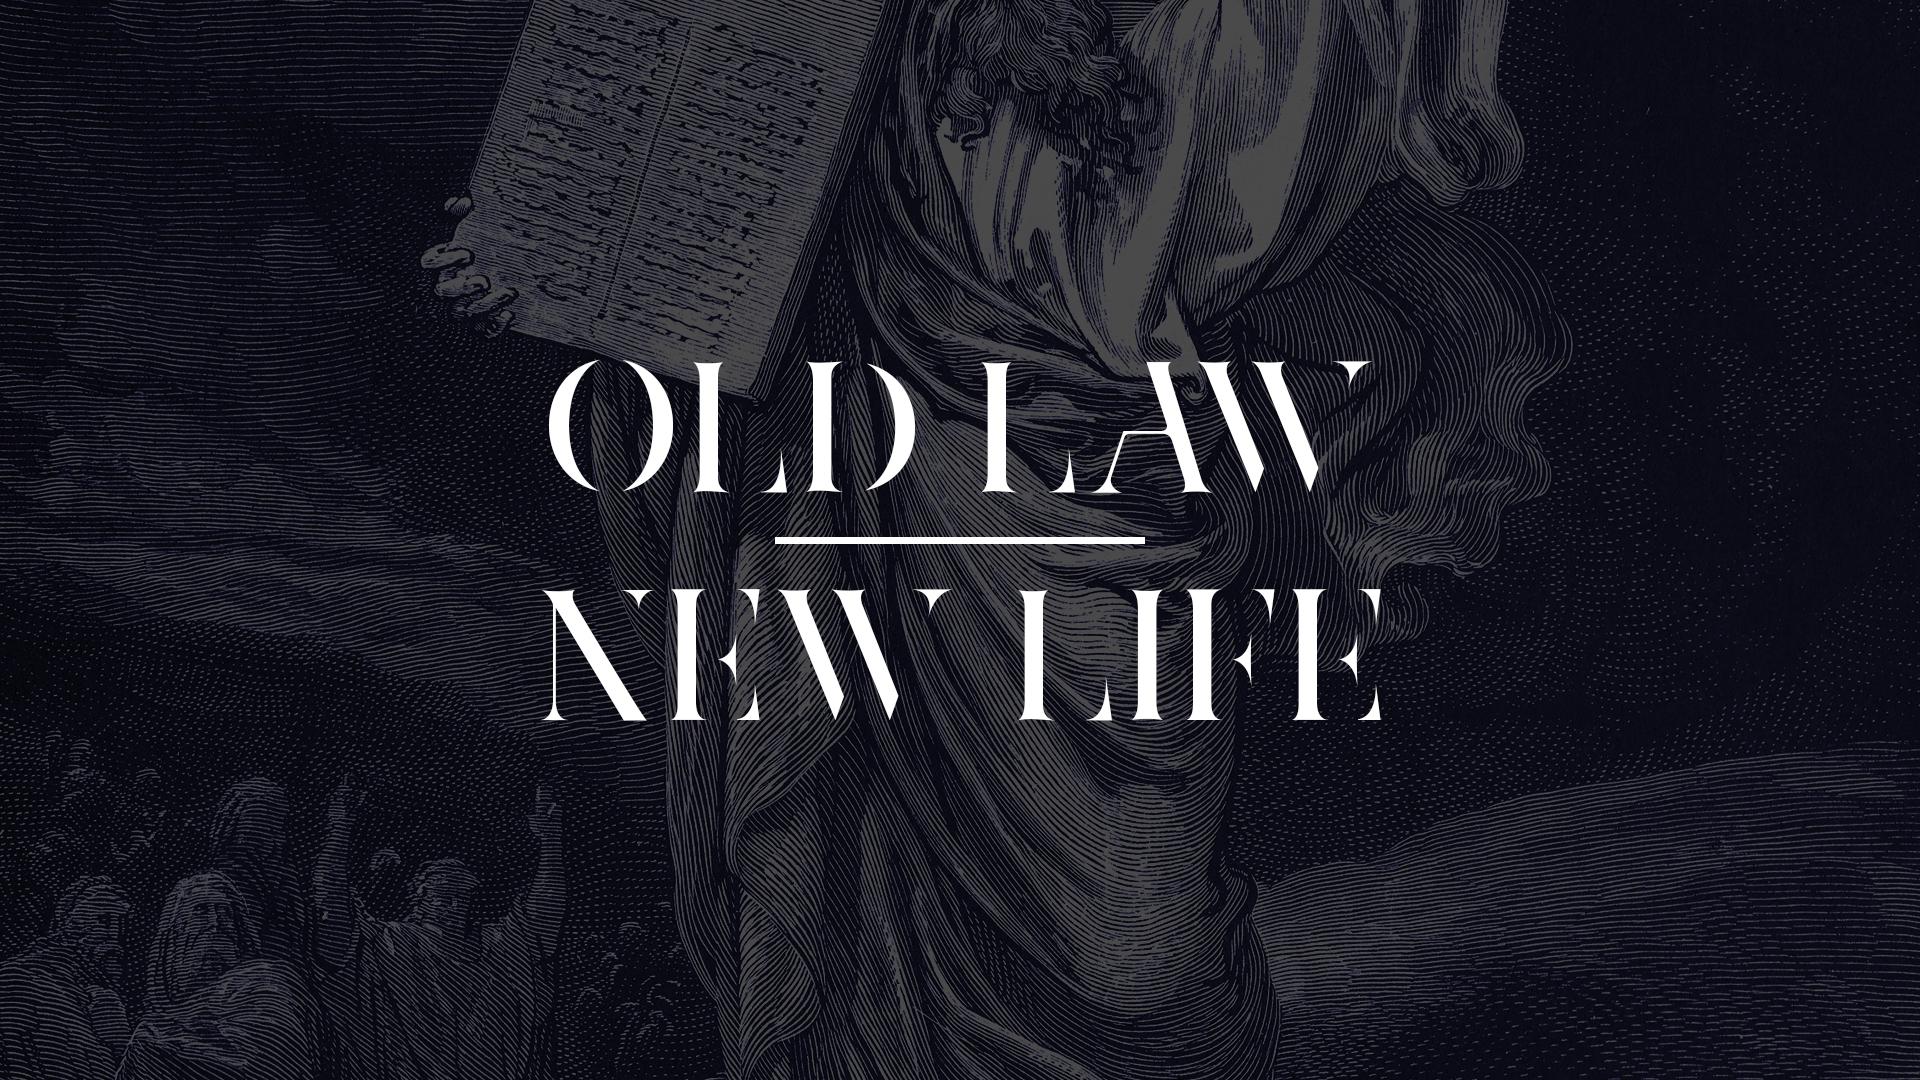 OldLawNewLife.jpg